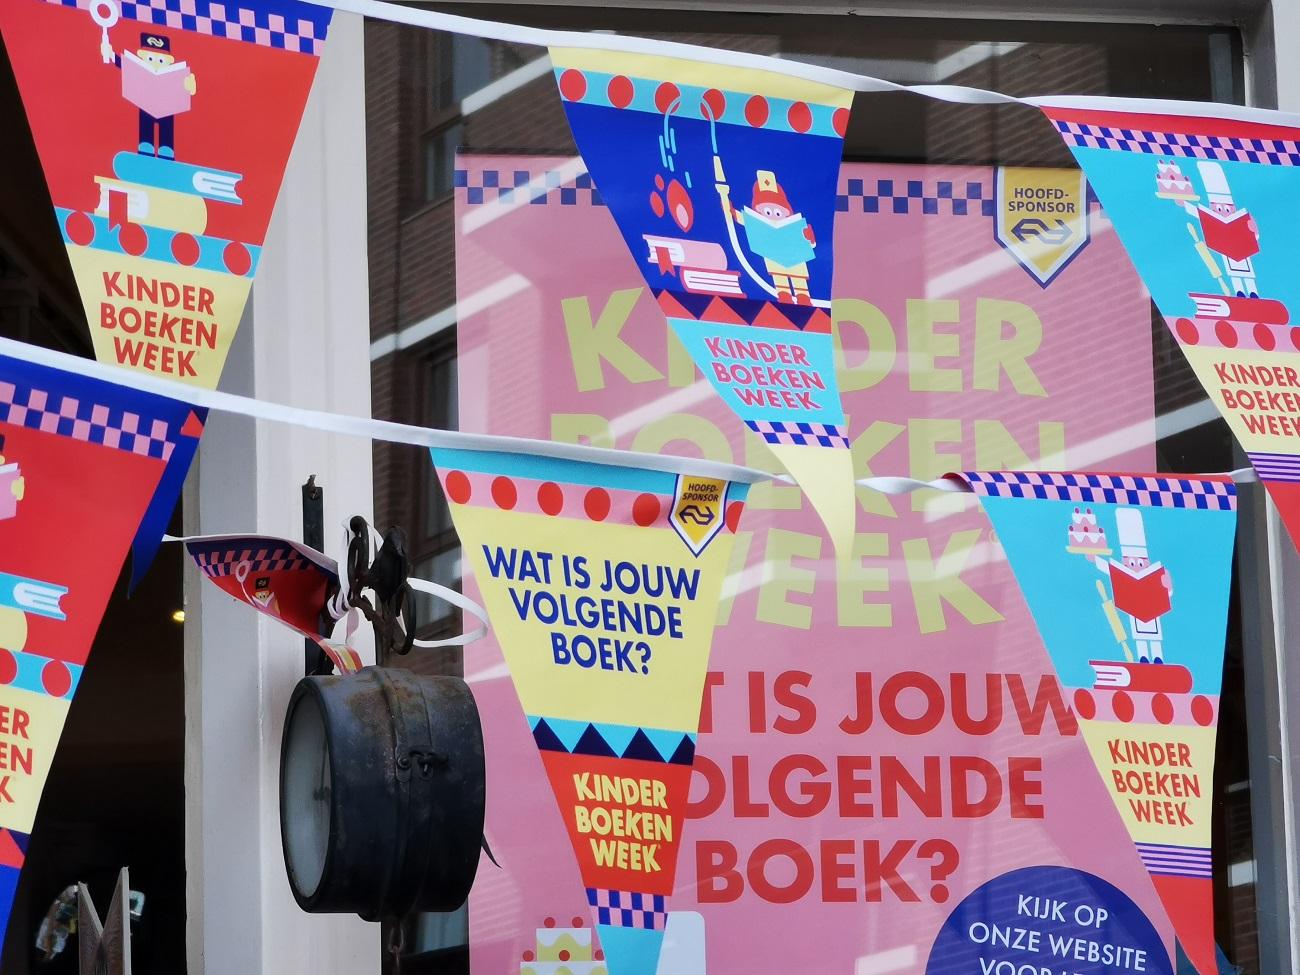 kinderboekenweek semana del libro infantil en paises bajos portada